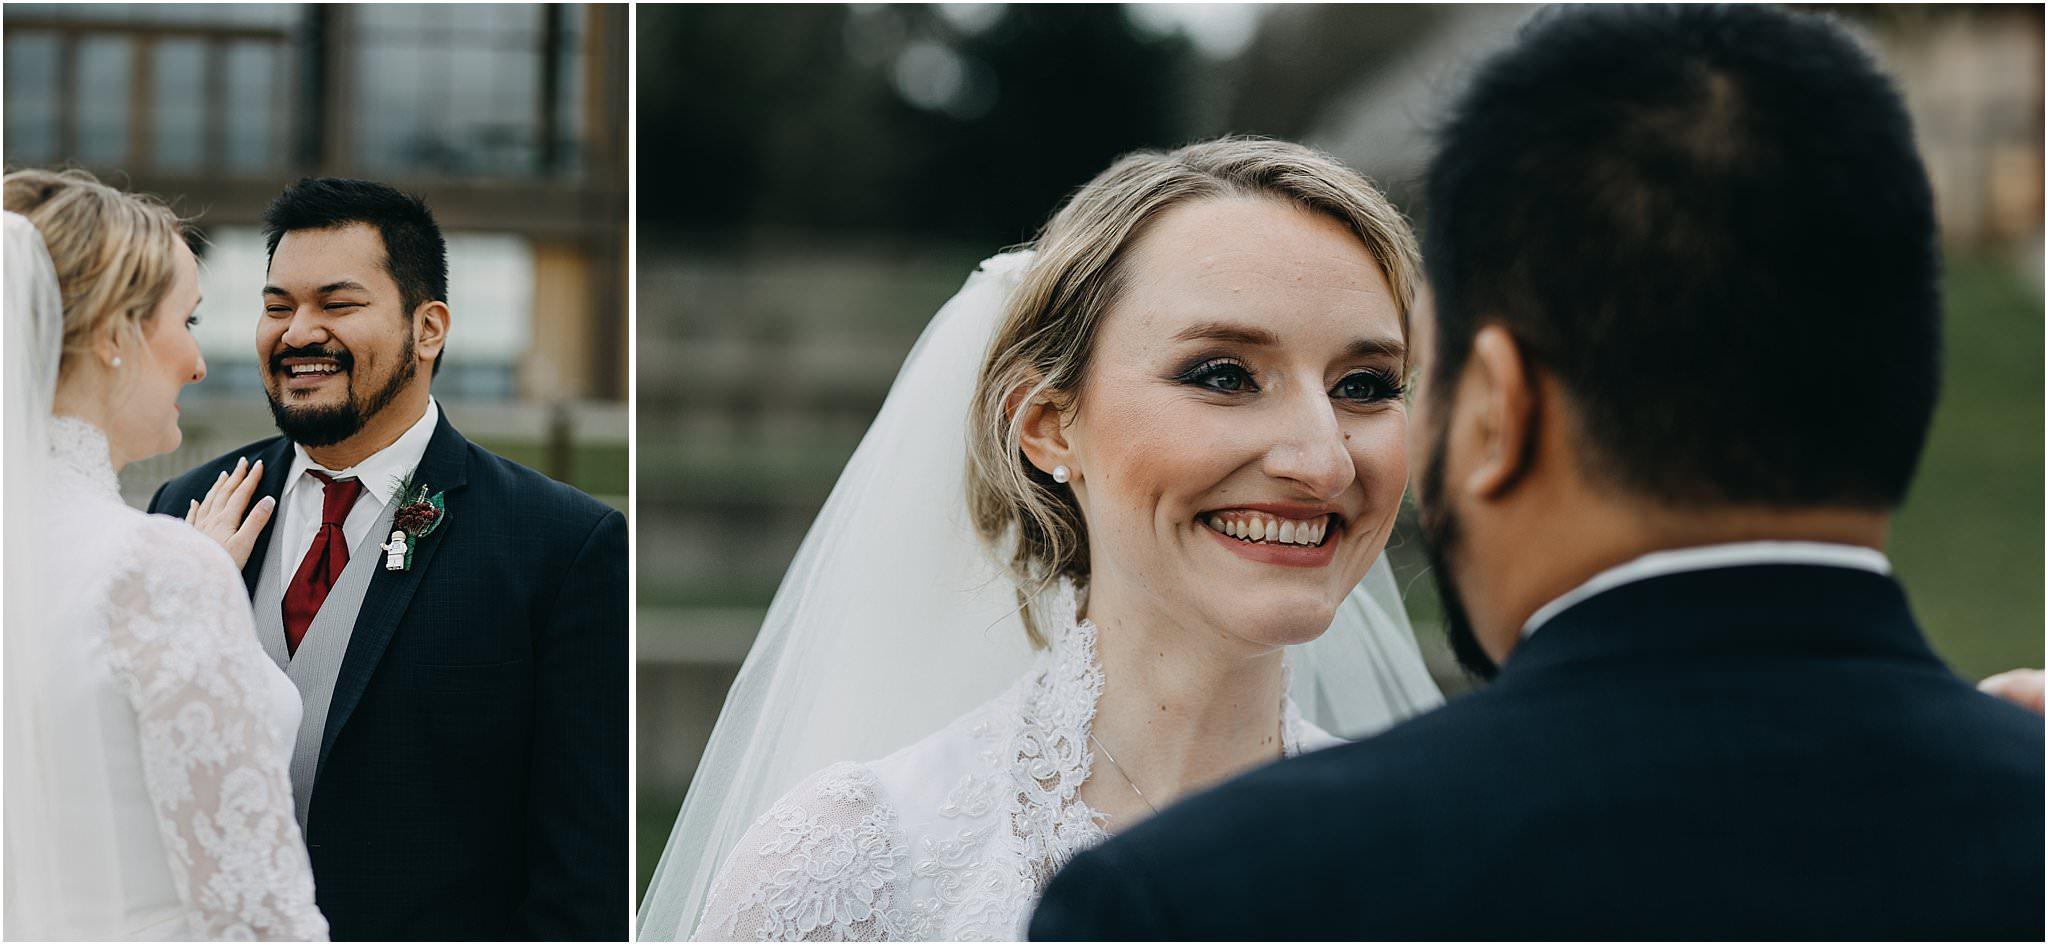 katy-robin-married-in-mukilteo-wedding22.jpg